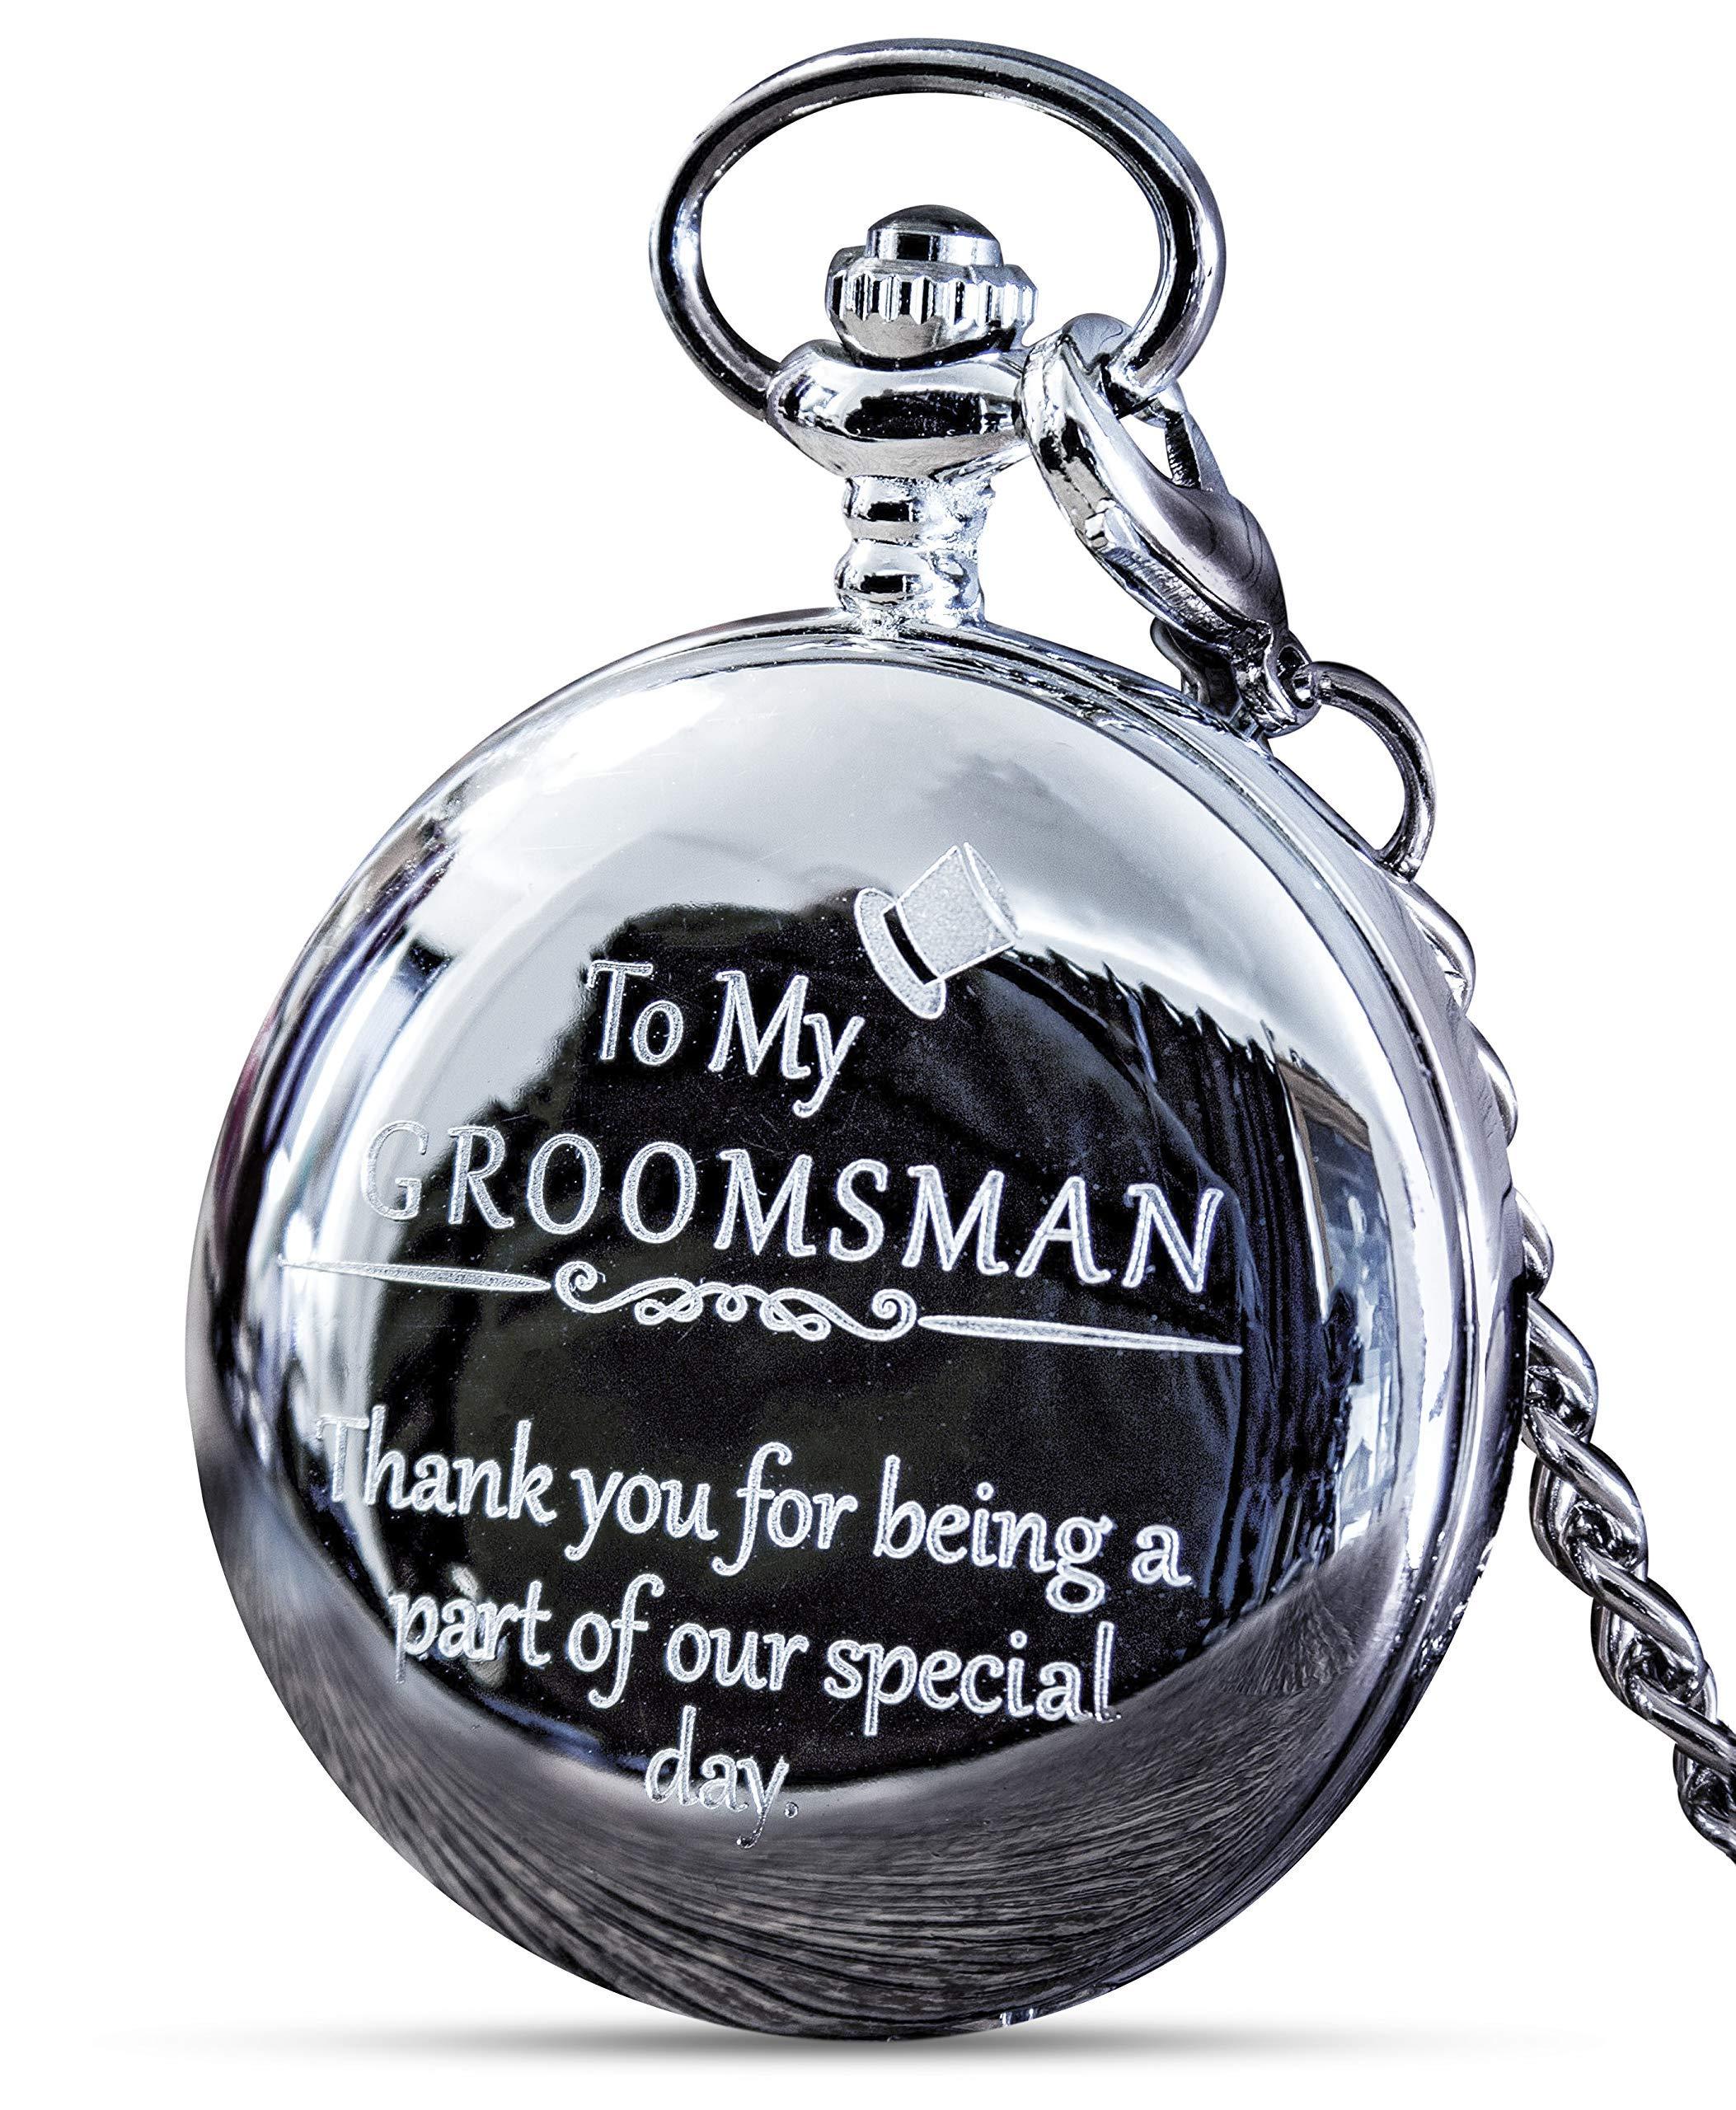 Groomsmen Gifts for Wedding or Proposal - Engraved Groomsman Pocket Watch - Luxury Wedding Gift by FREDERICK JAMES